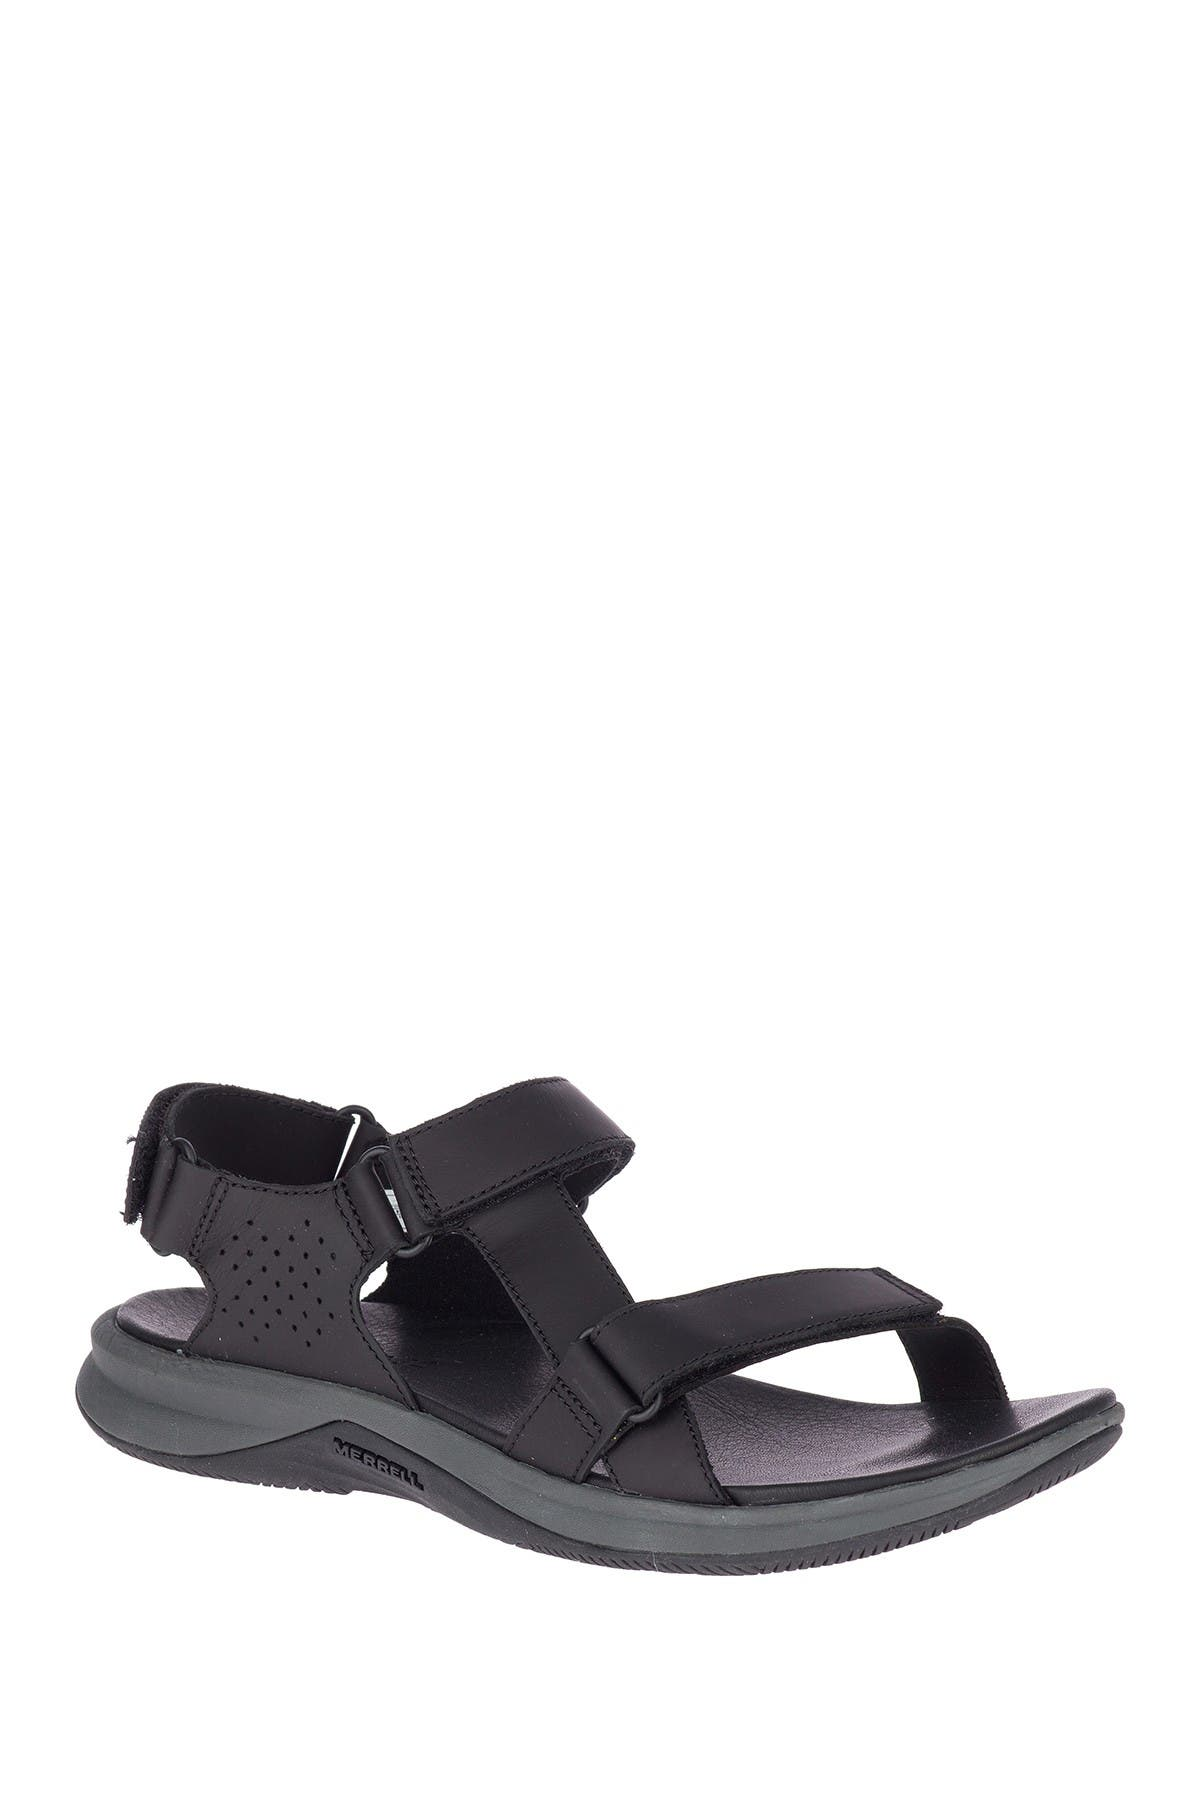 Image of Merrell Tideriser Luna Leather Strap Sandal